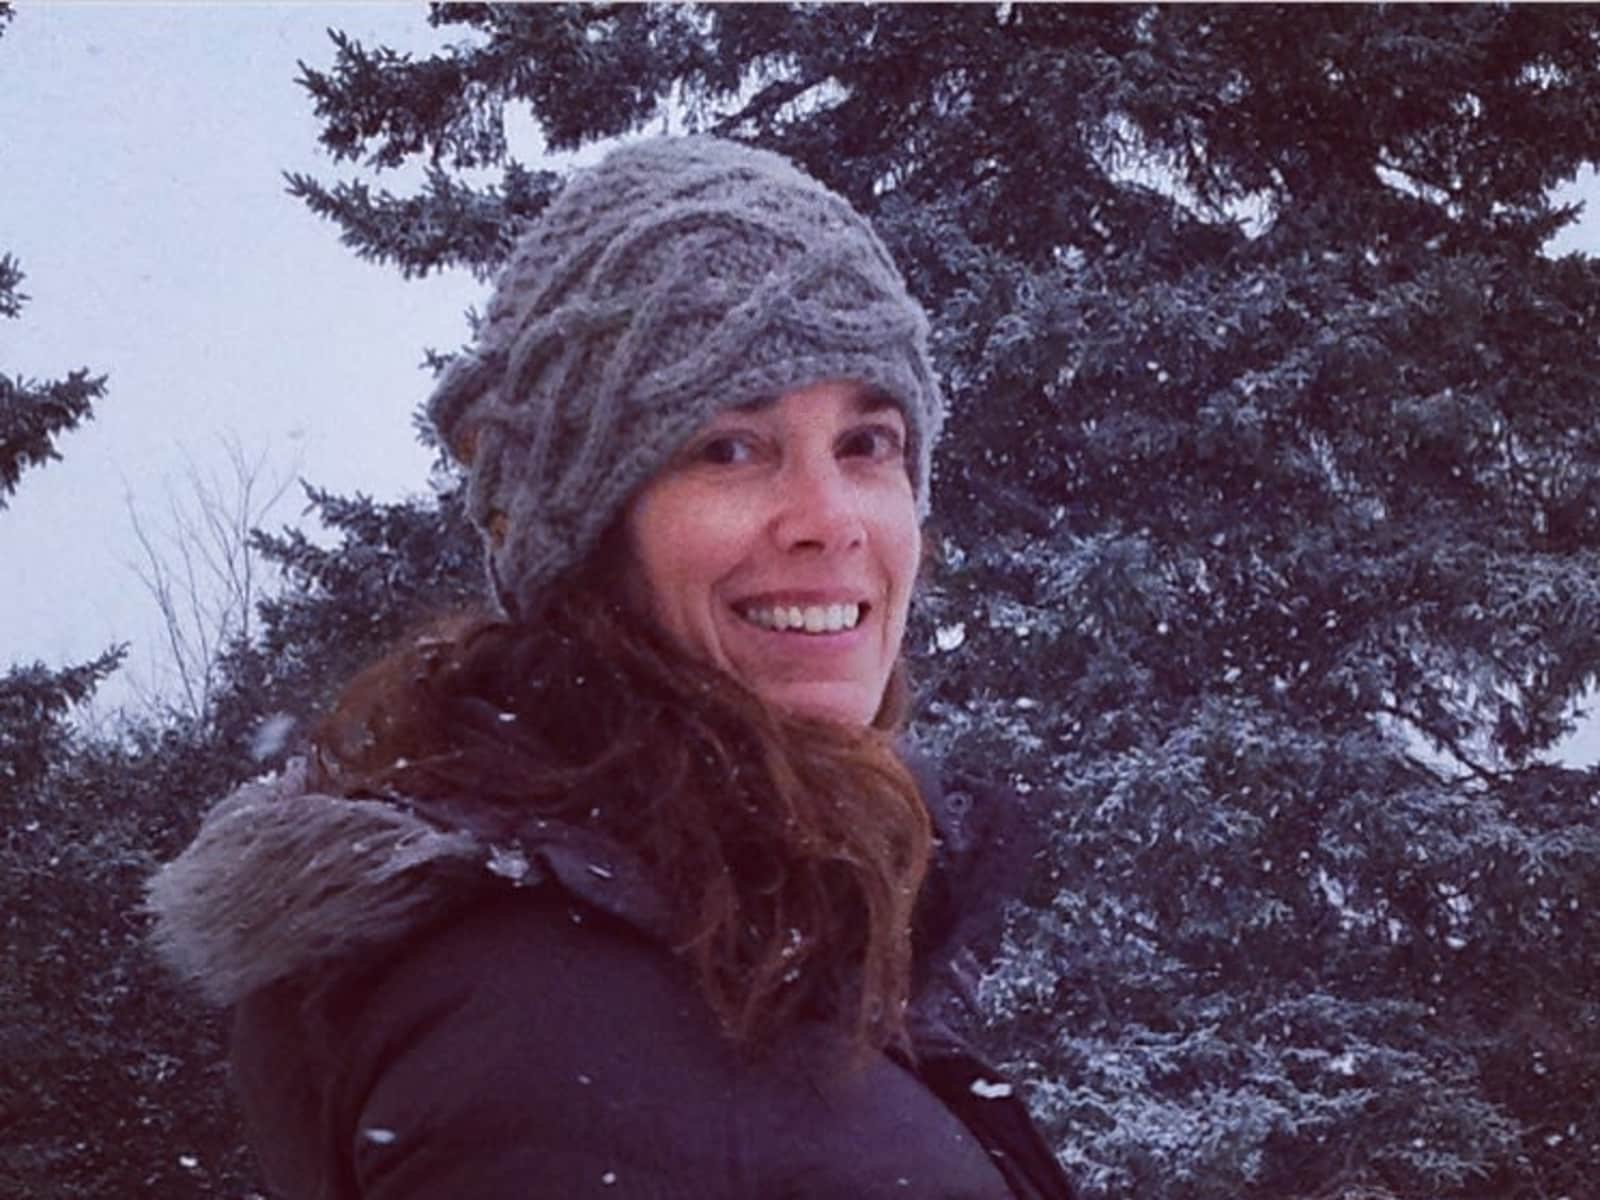 Catherine from Toronto, Ontario, Canada